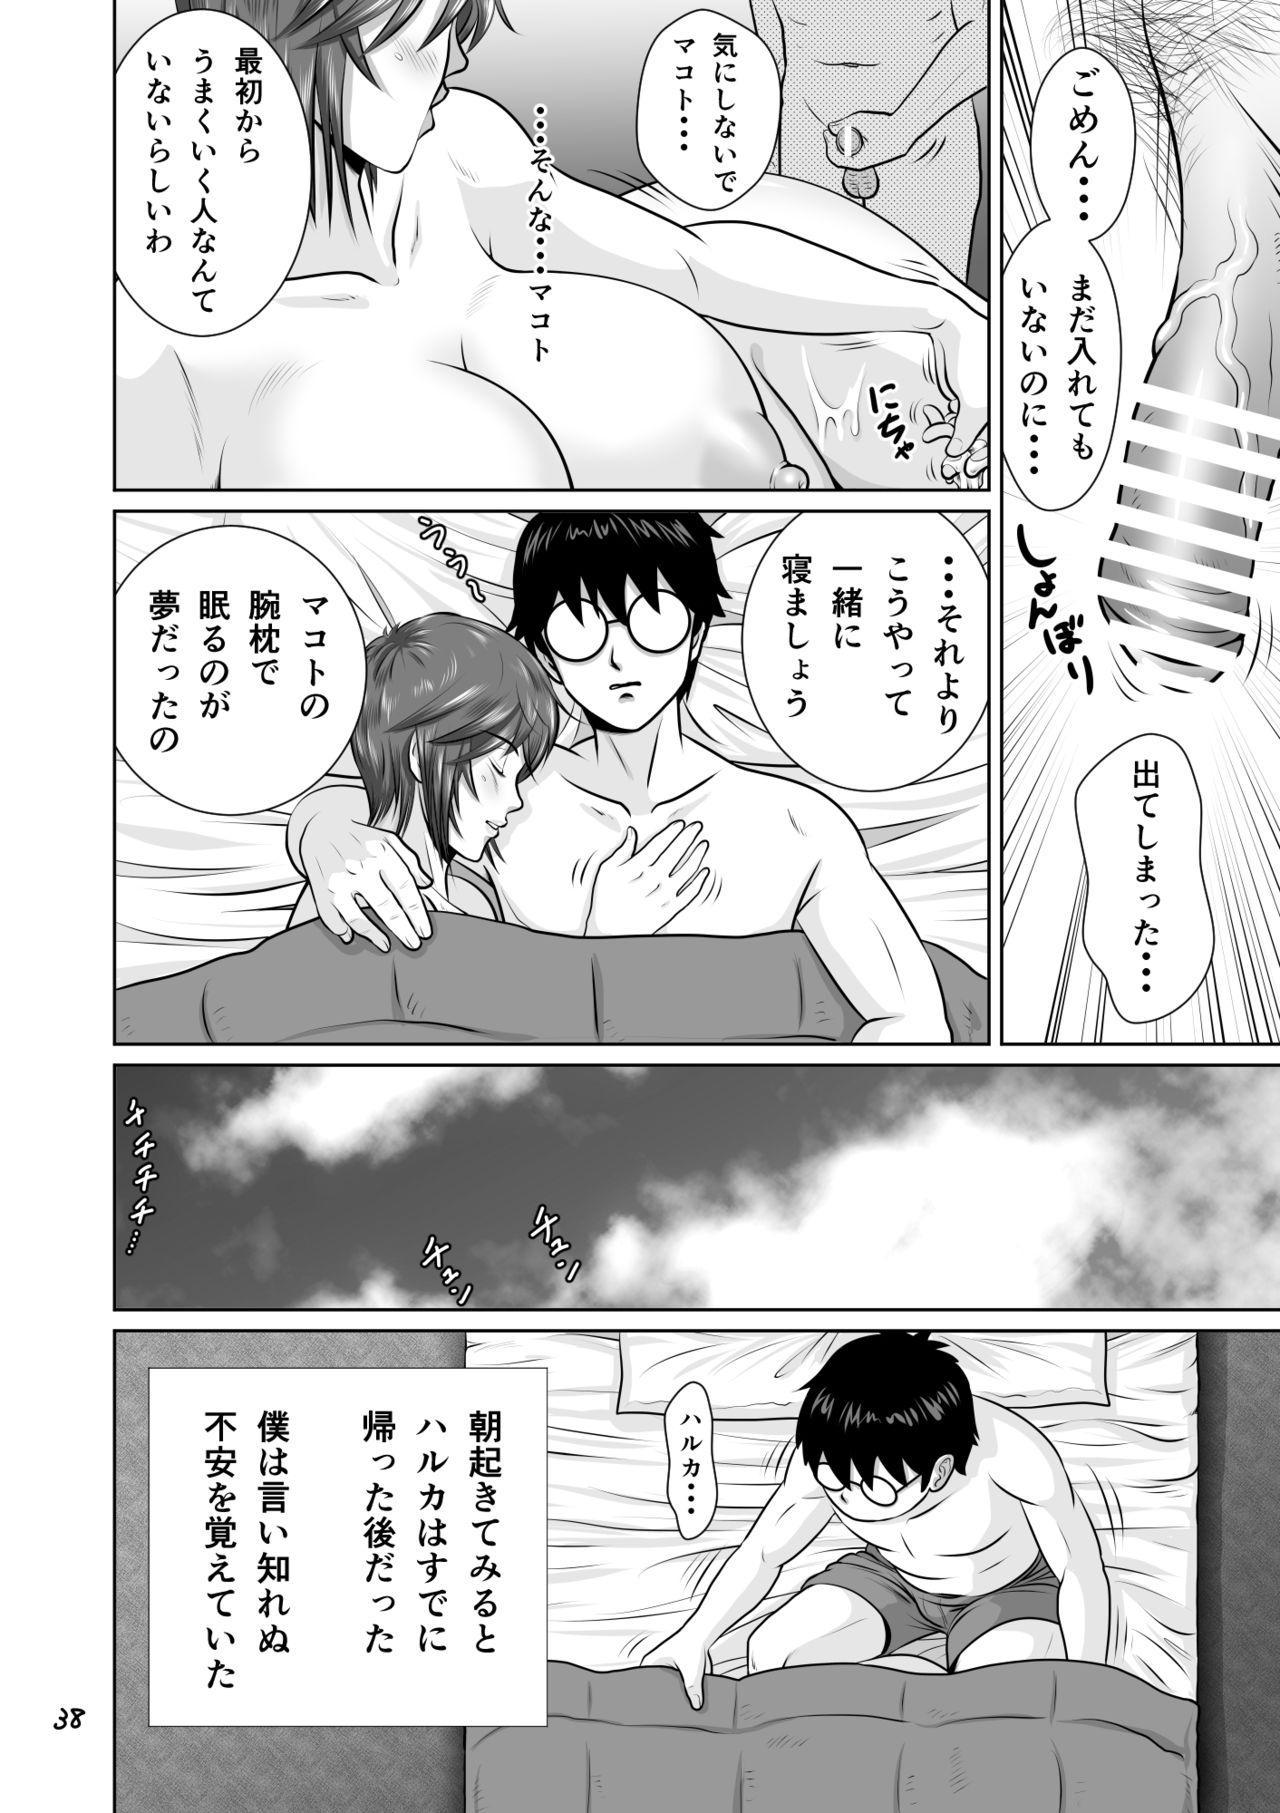 Netorare Osananajimi Haruka-chan Kiki Ippatsu!! 38